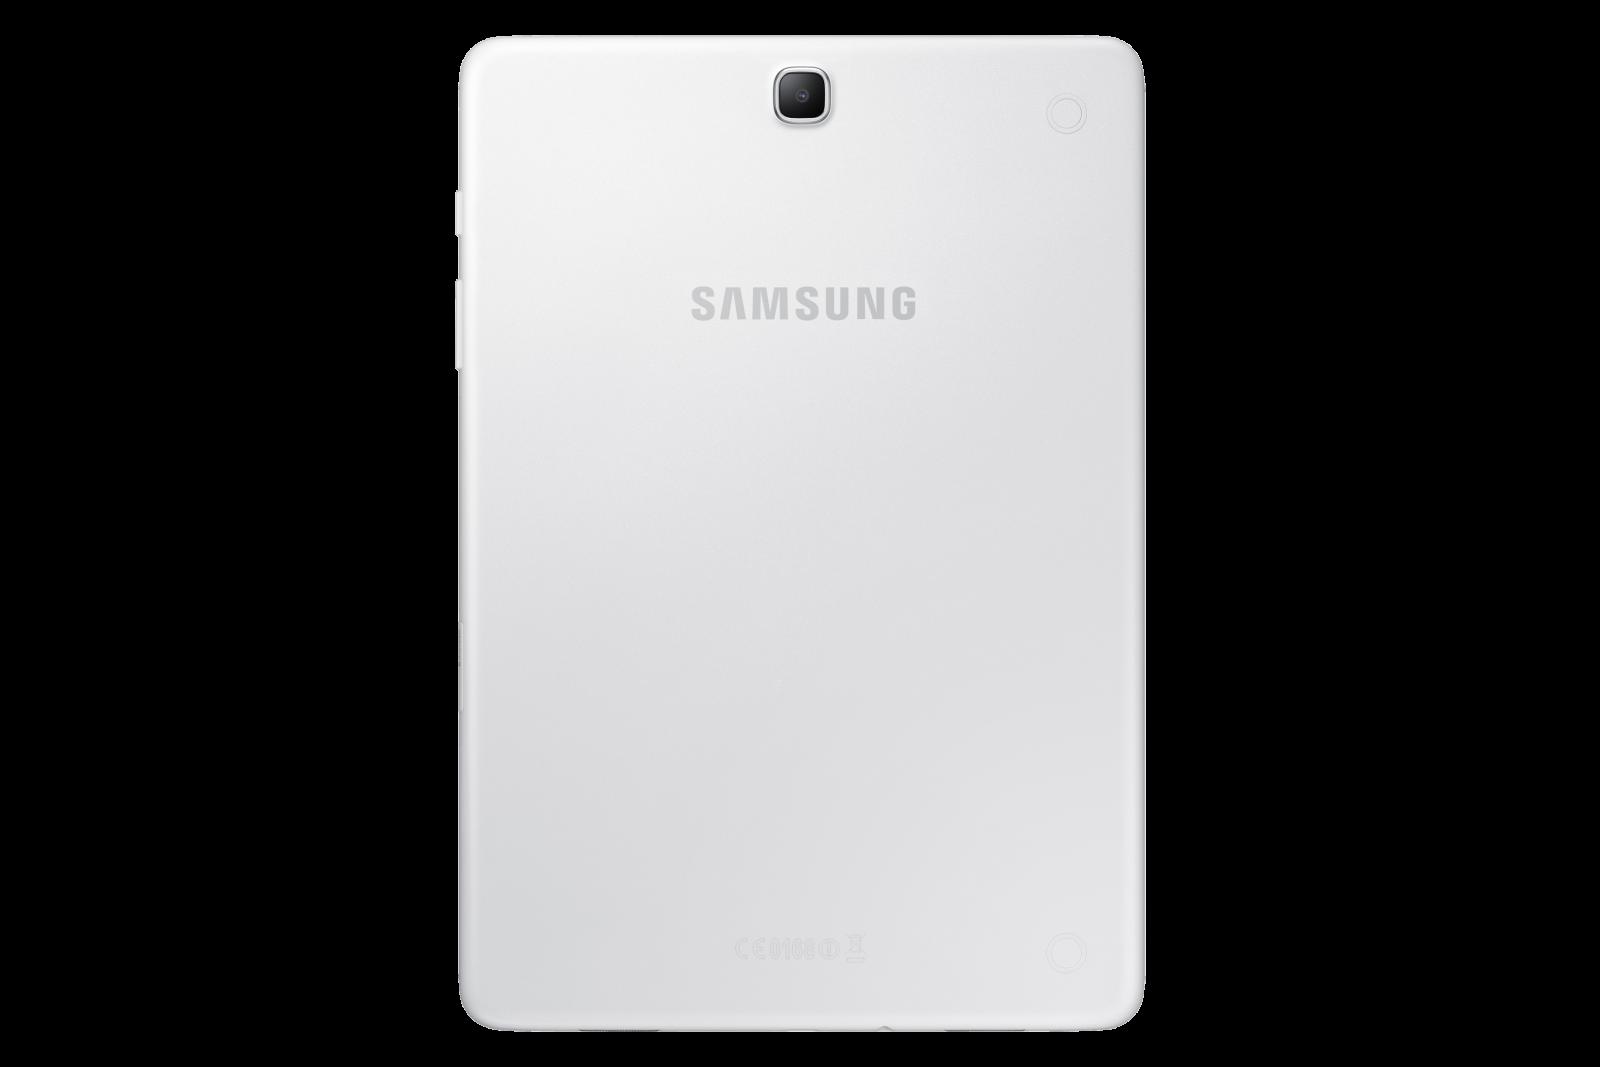 SM-T550_002_Back_White